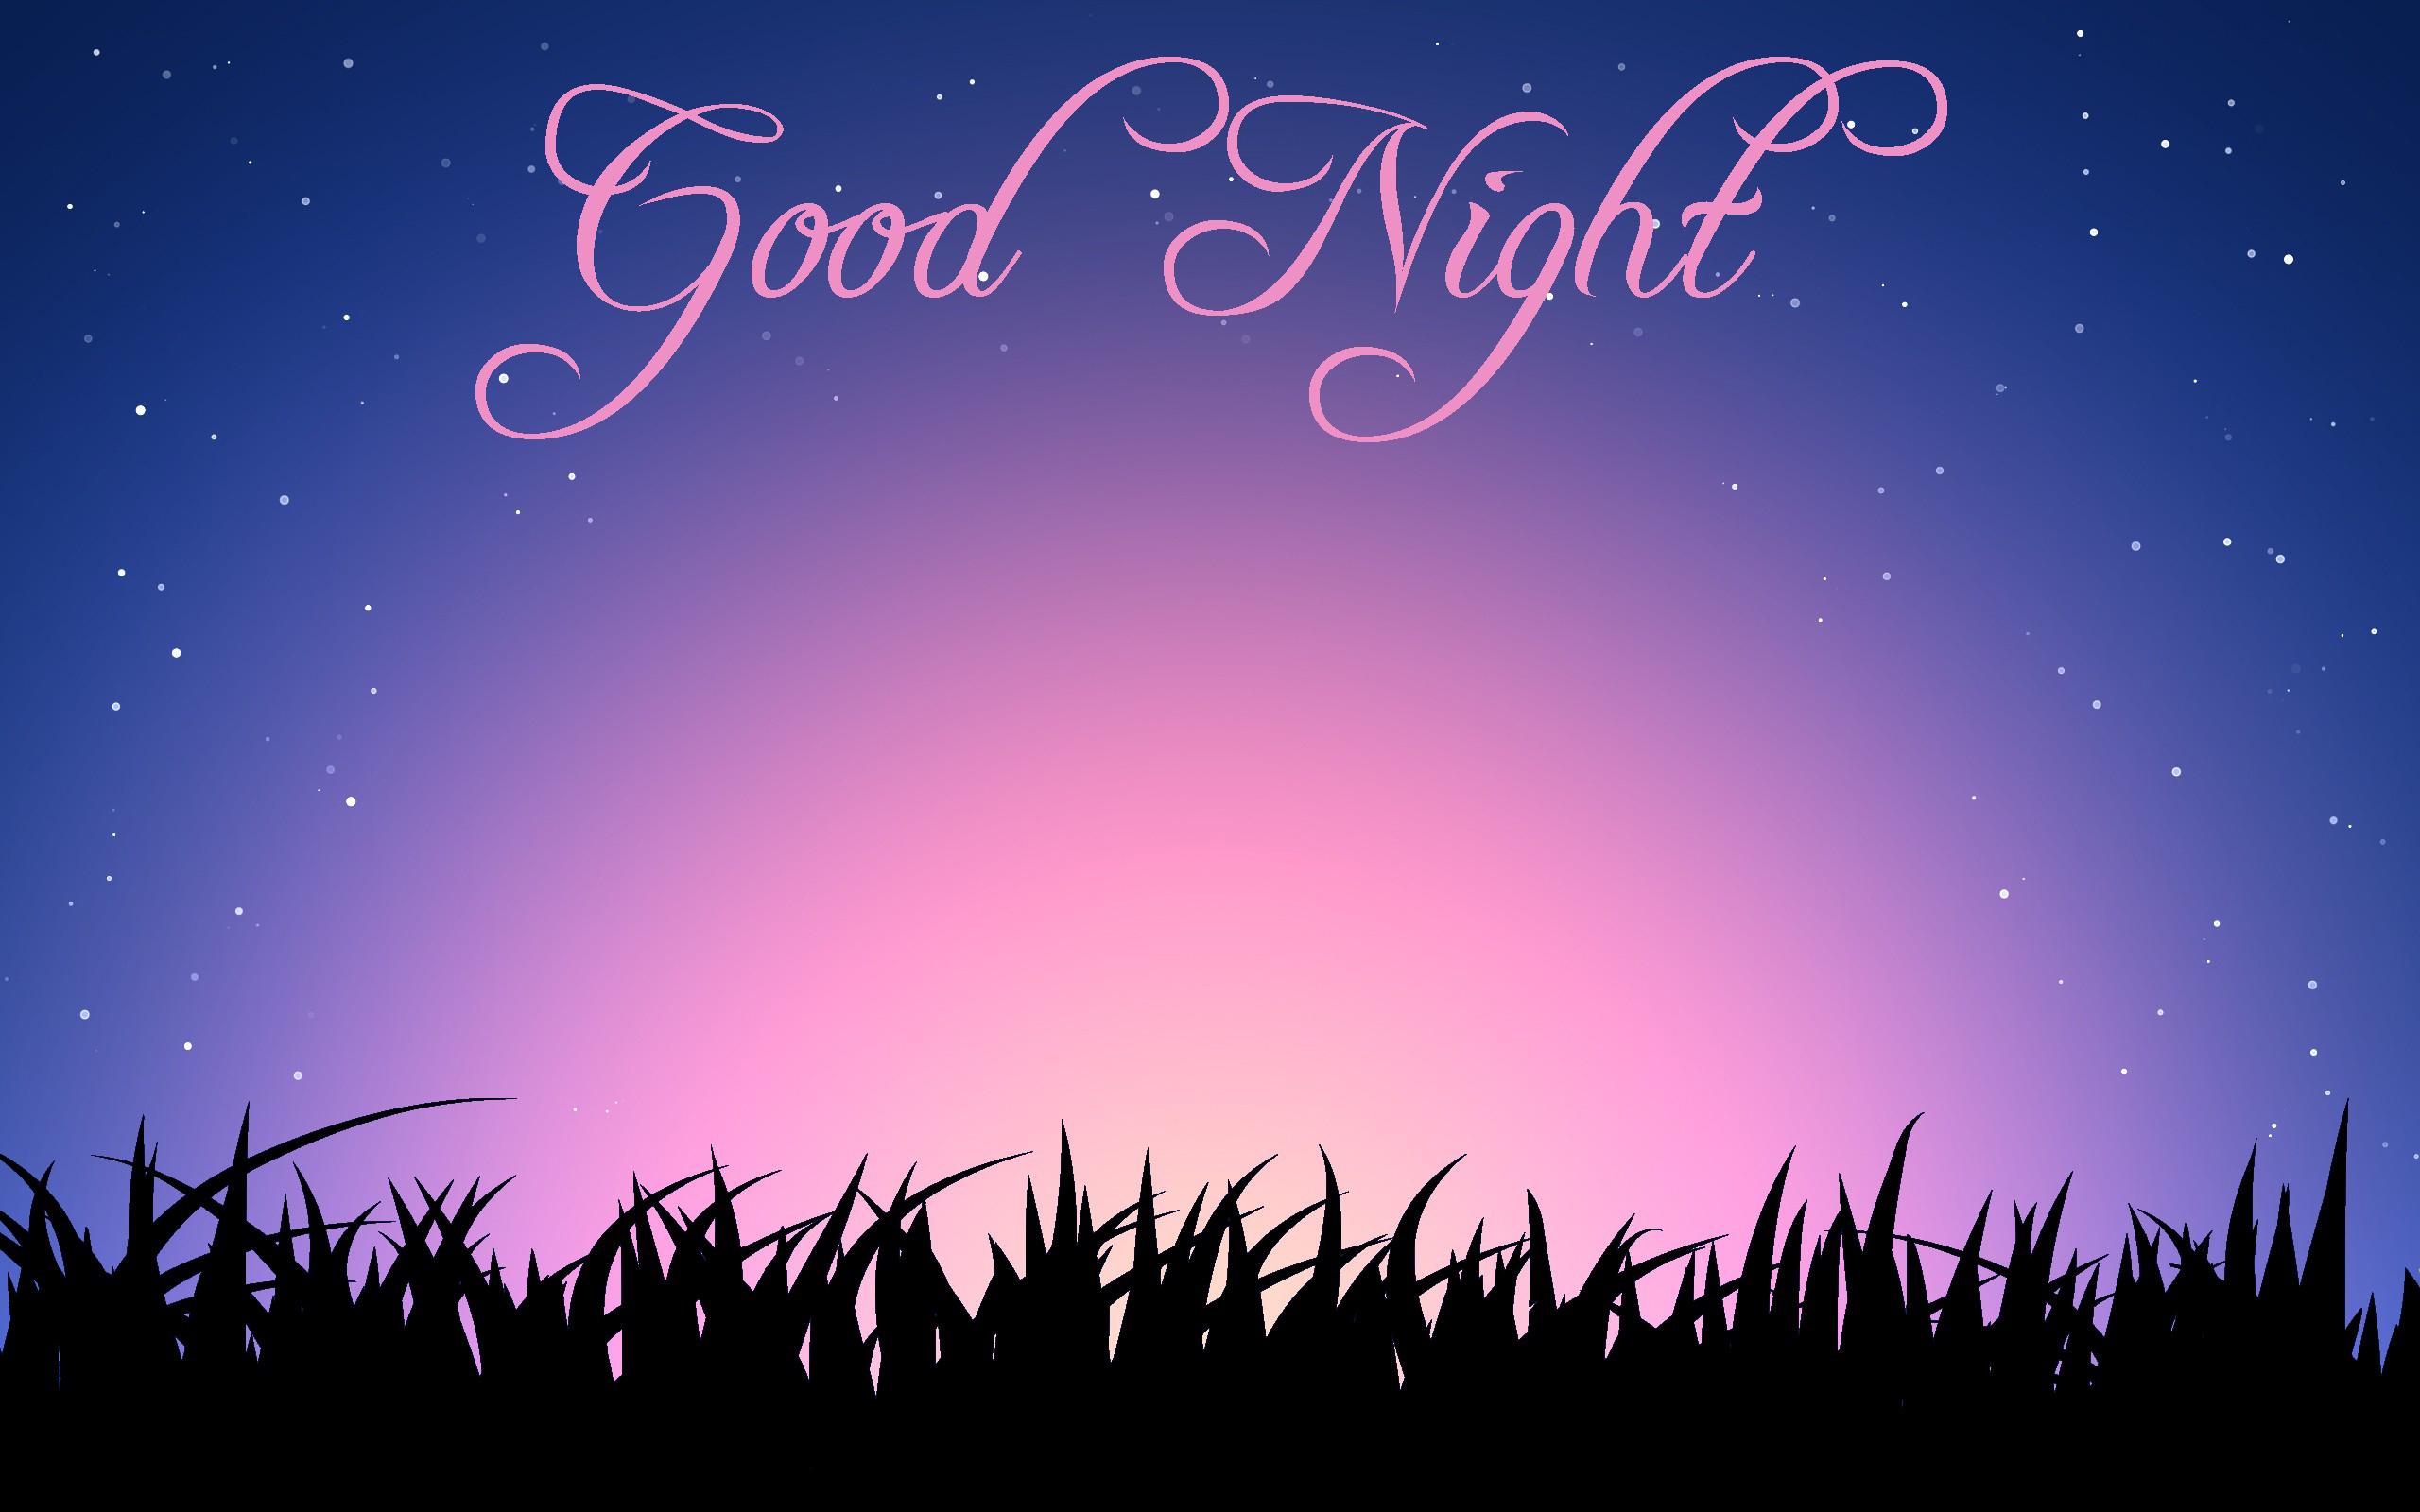 Download free download hd desktop wallpaper backgrounds images fantasic good night status download voltagebd Image collections